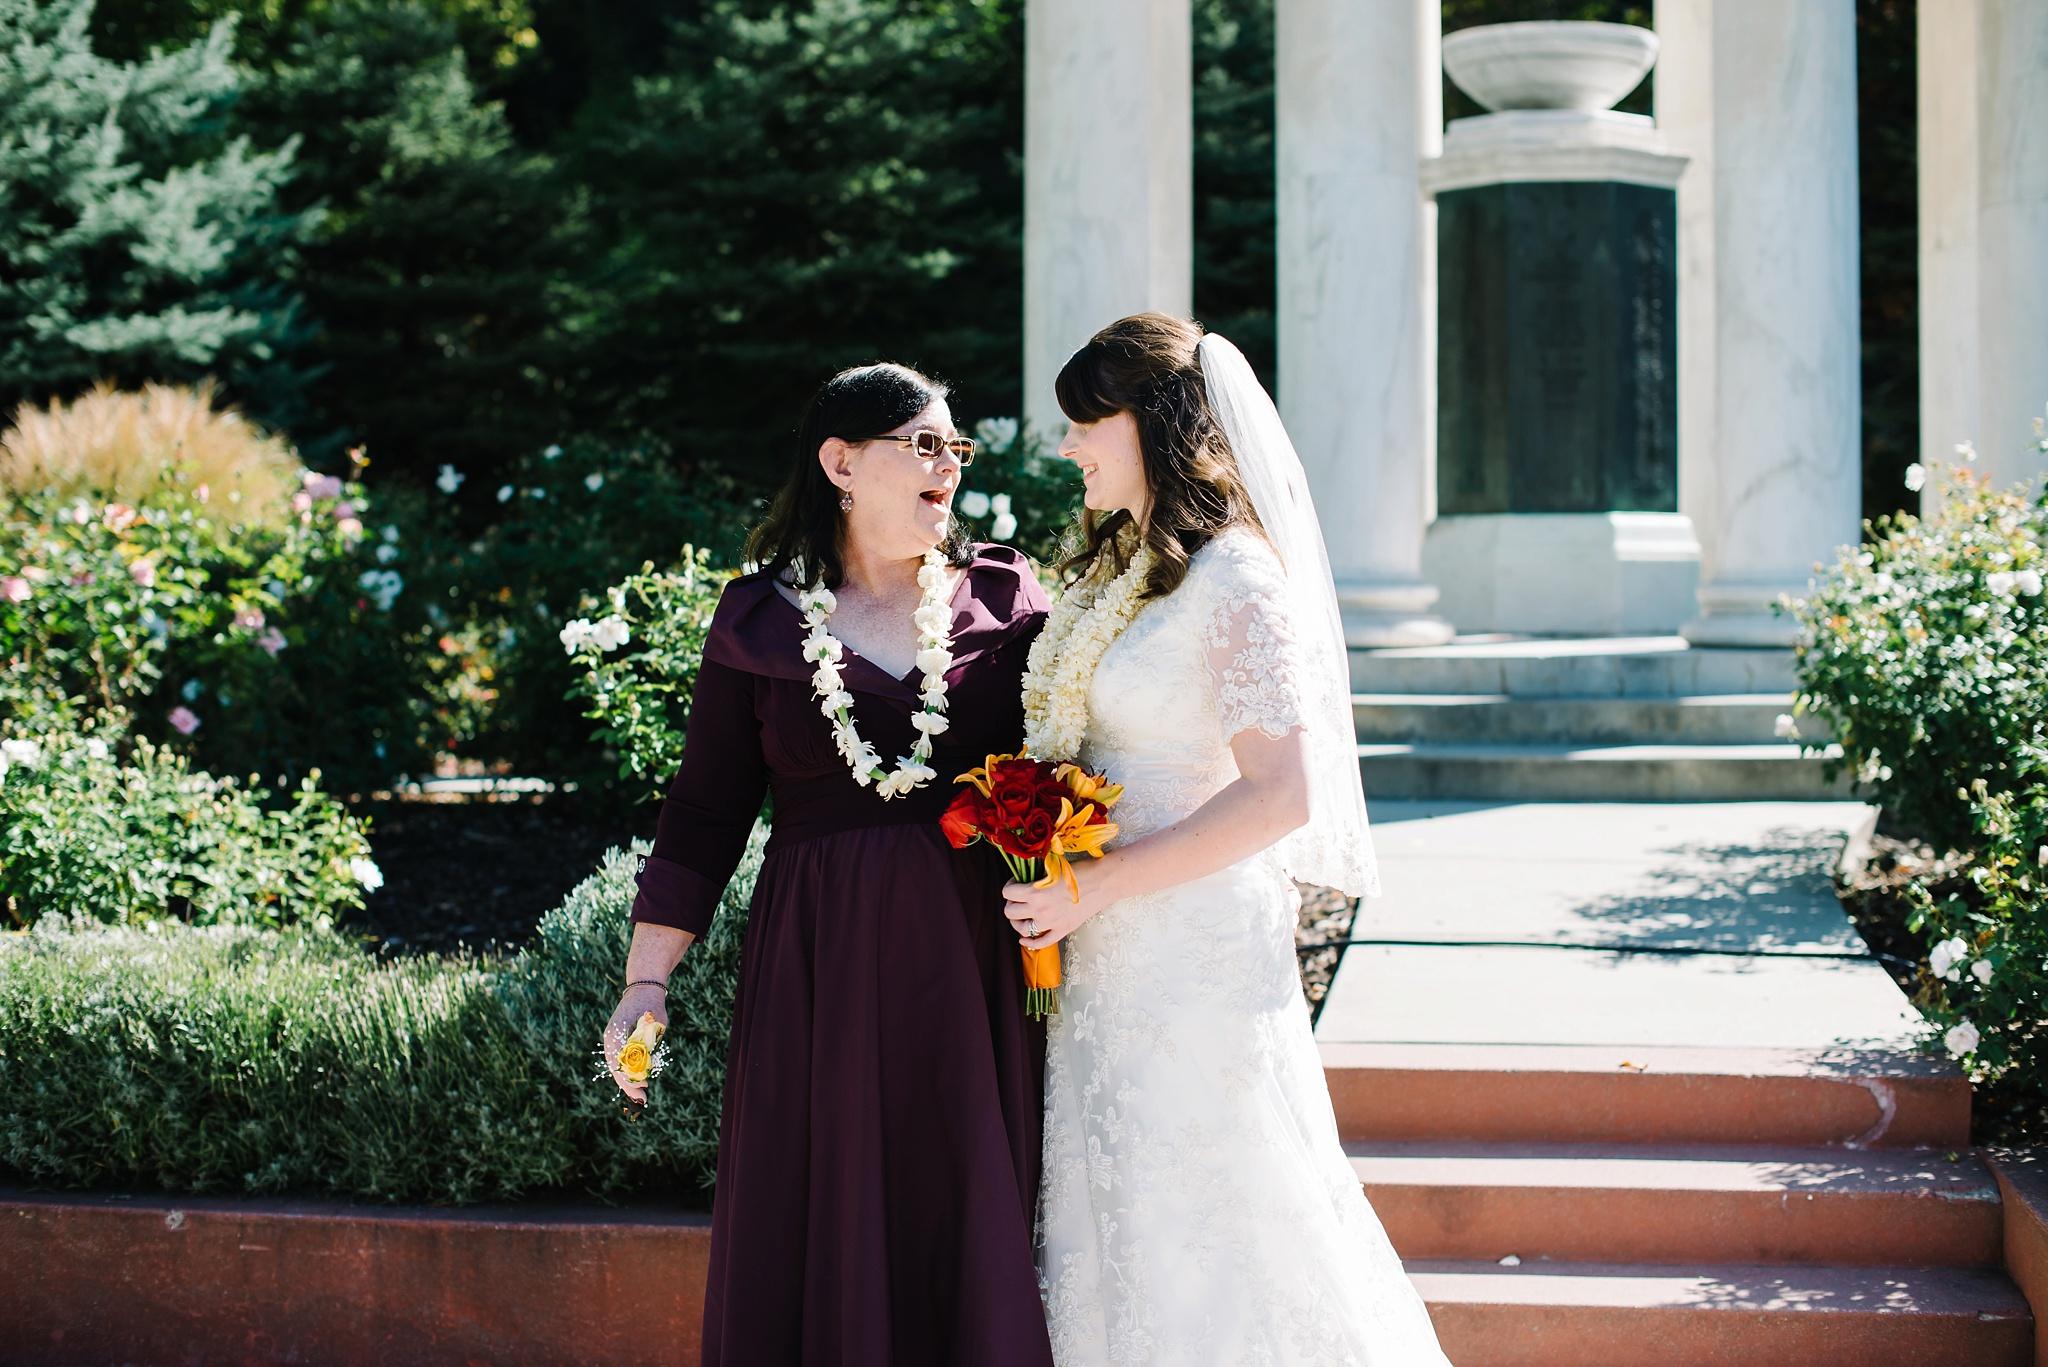 Park City Wedding Photographer Ali Sumsion 048